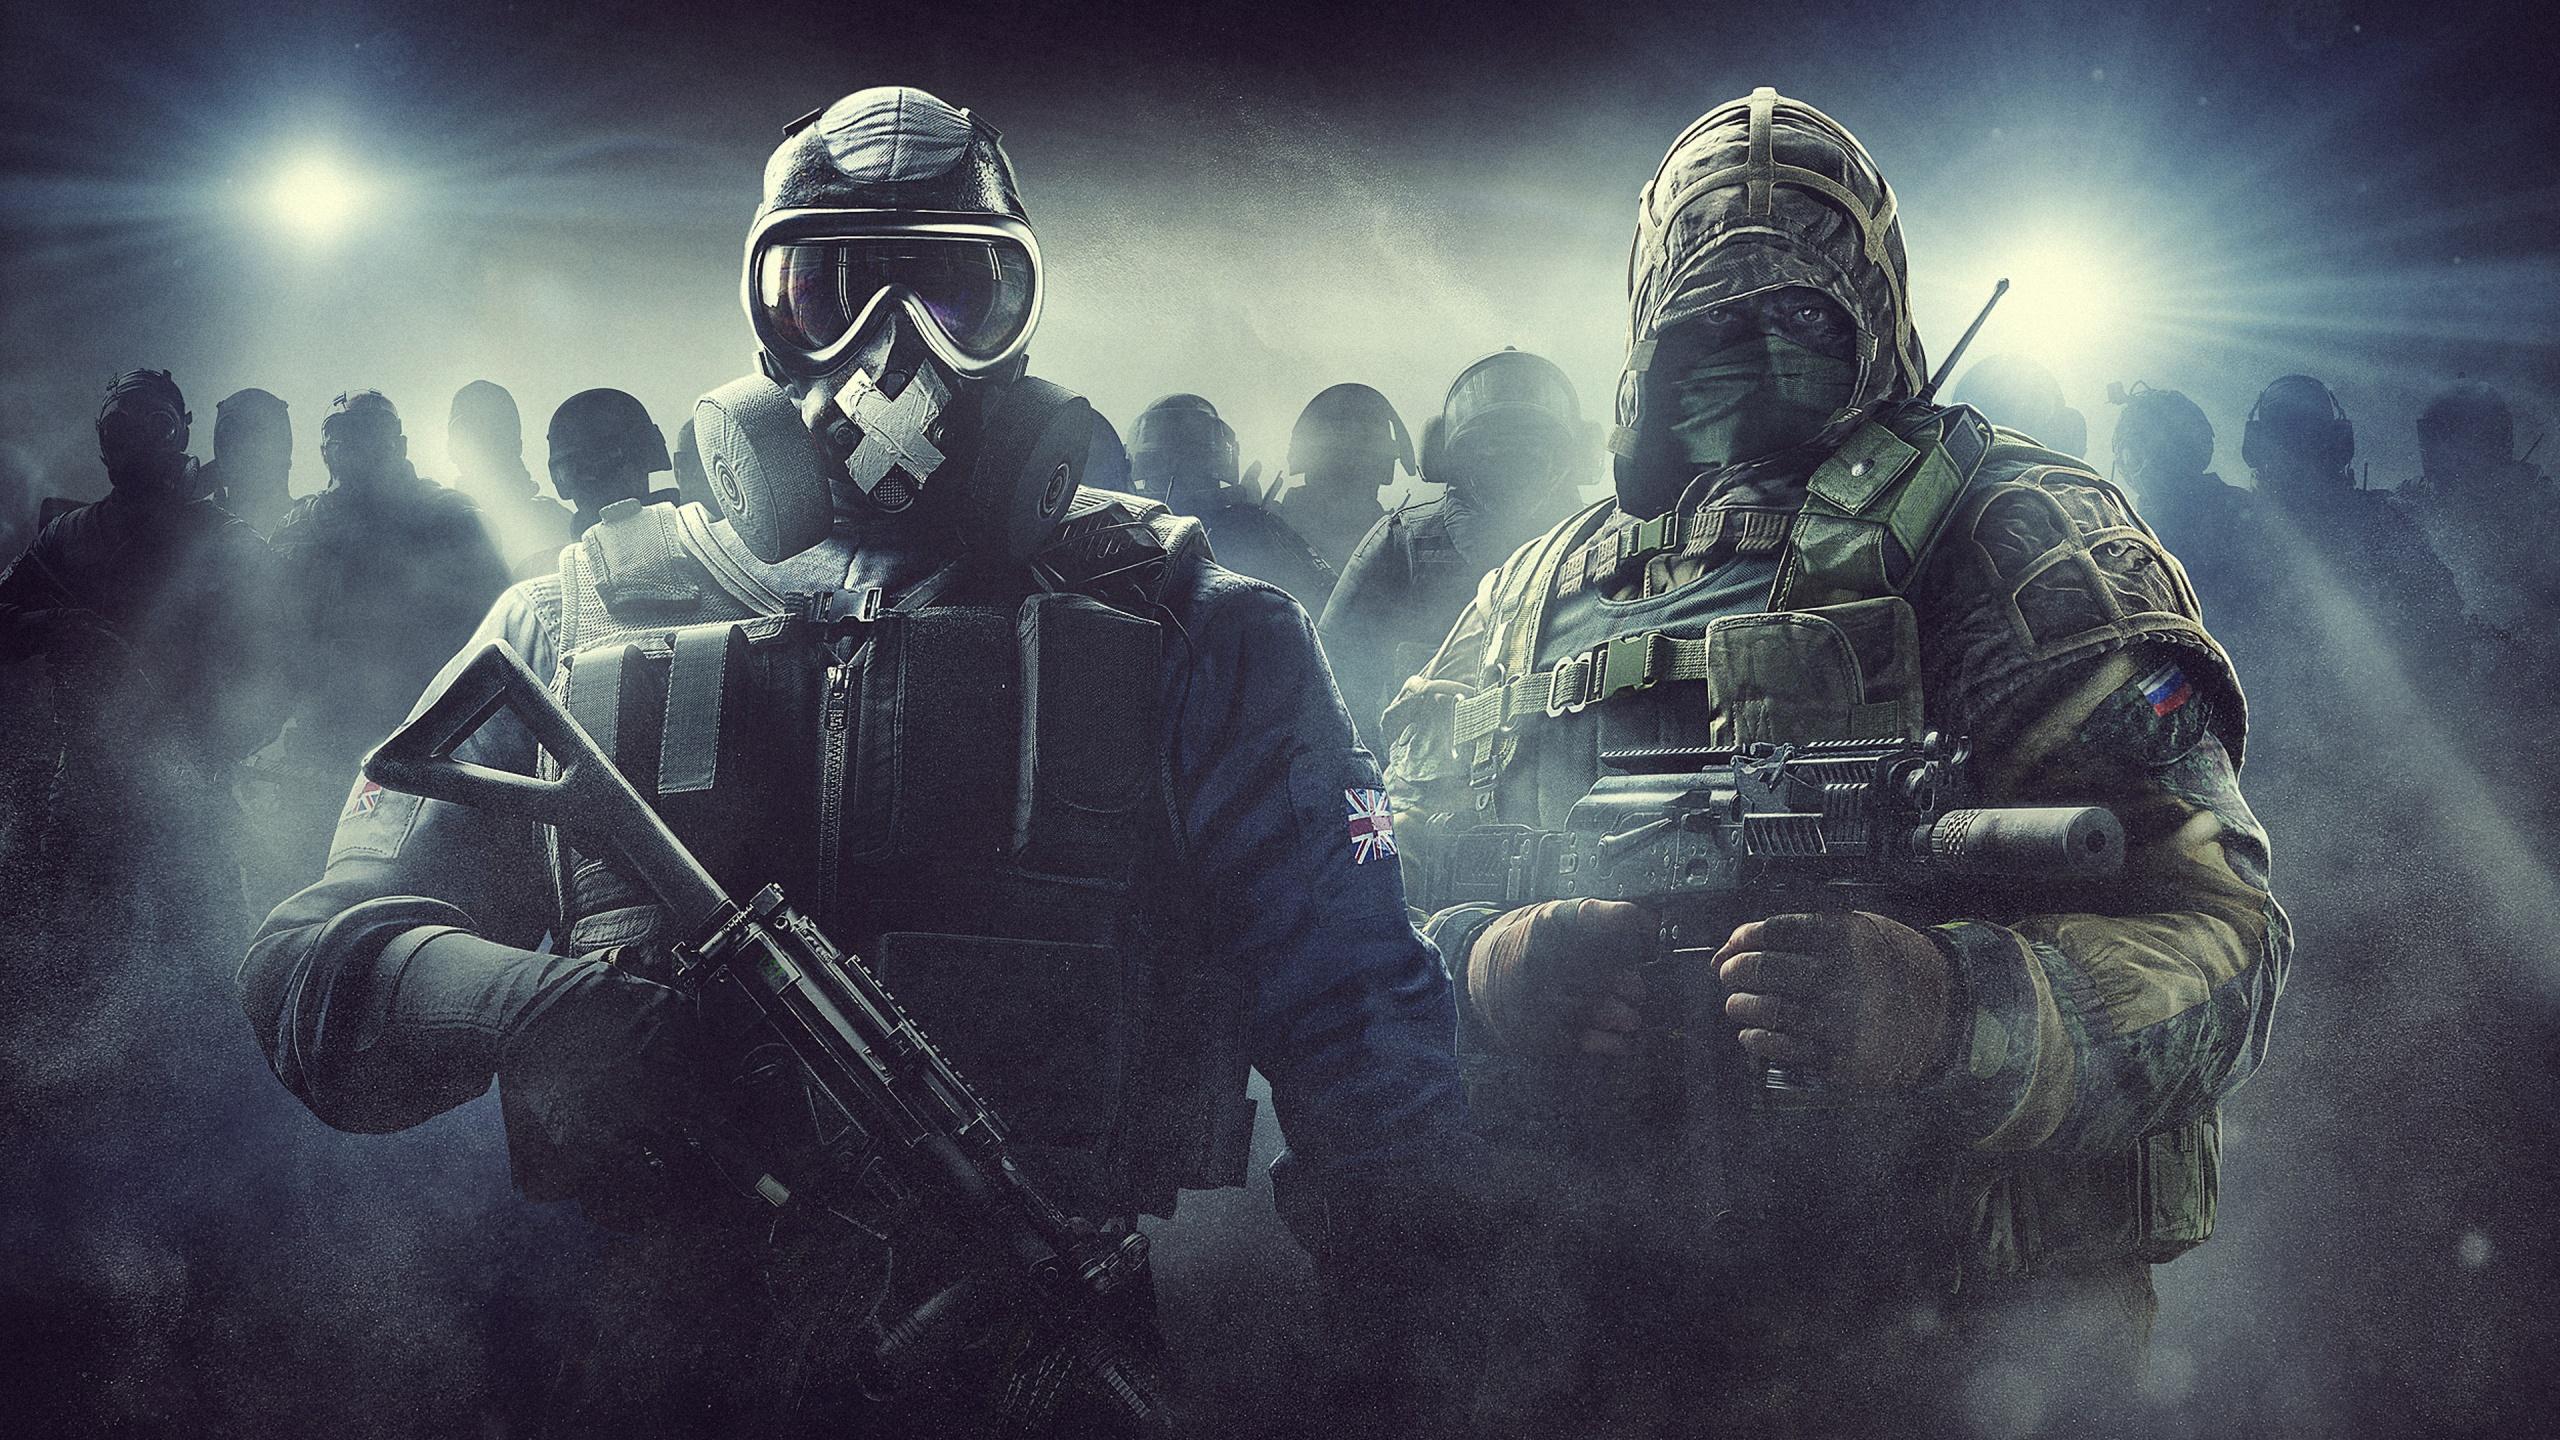 Mute Kapkan Tom Clancys Rainbow Six Siege Wallpapers In Jpg Format